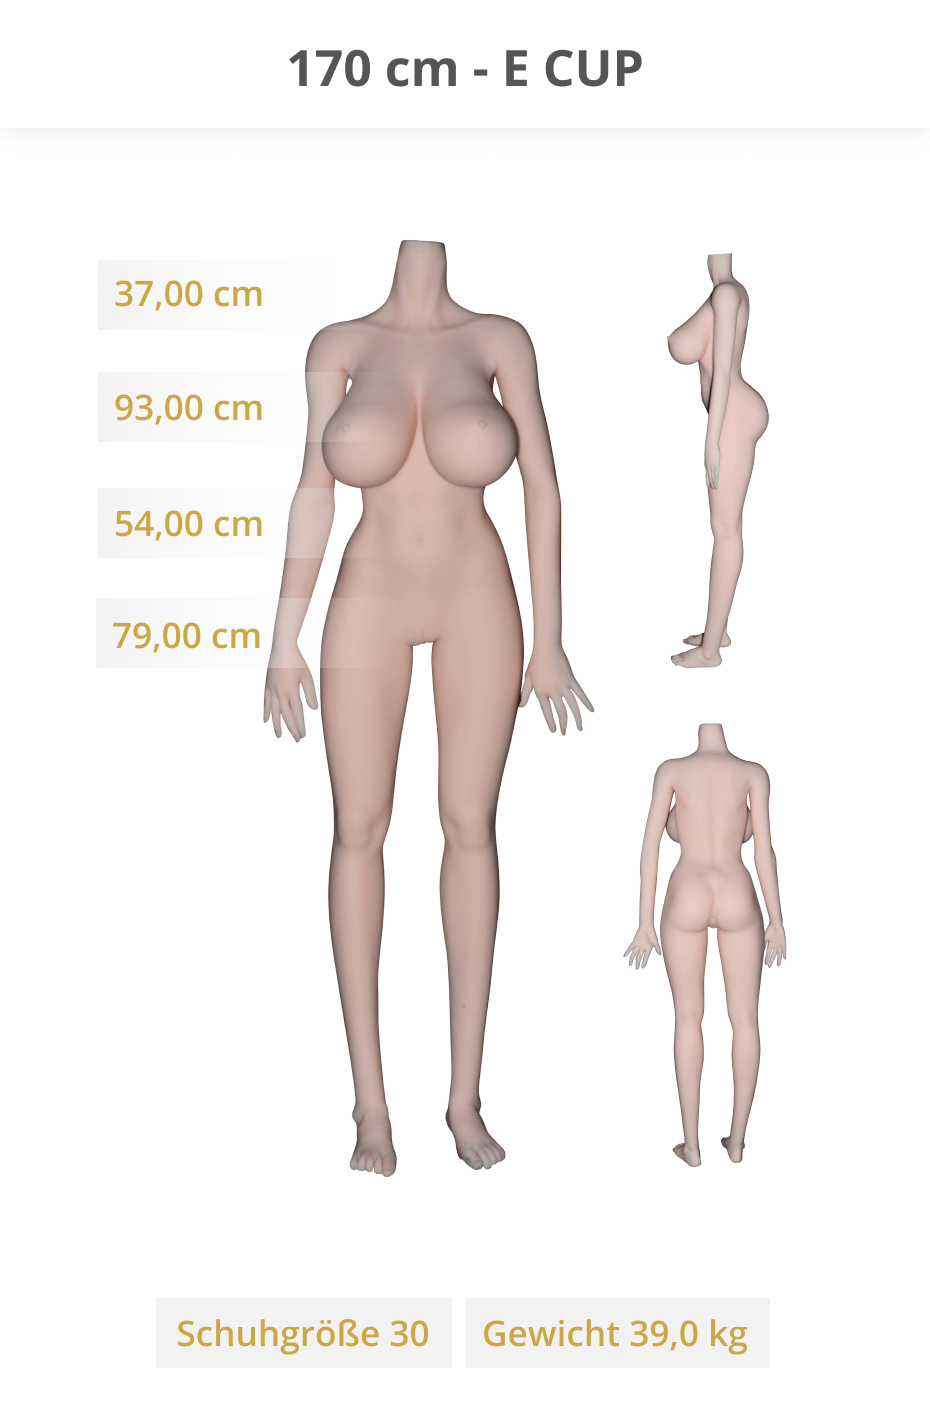 6ye-Dolls-170-cm-E-CUP